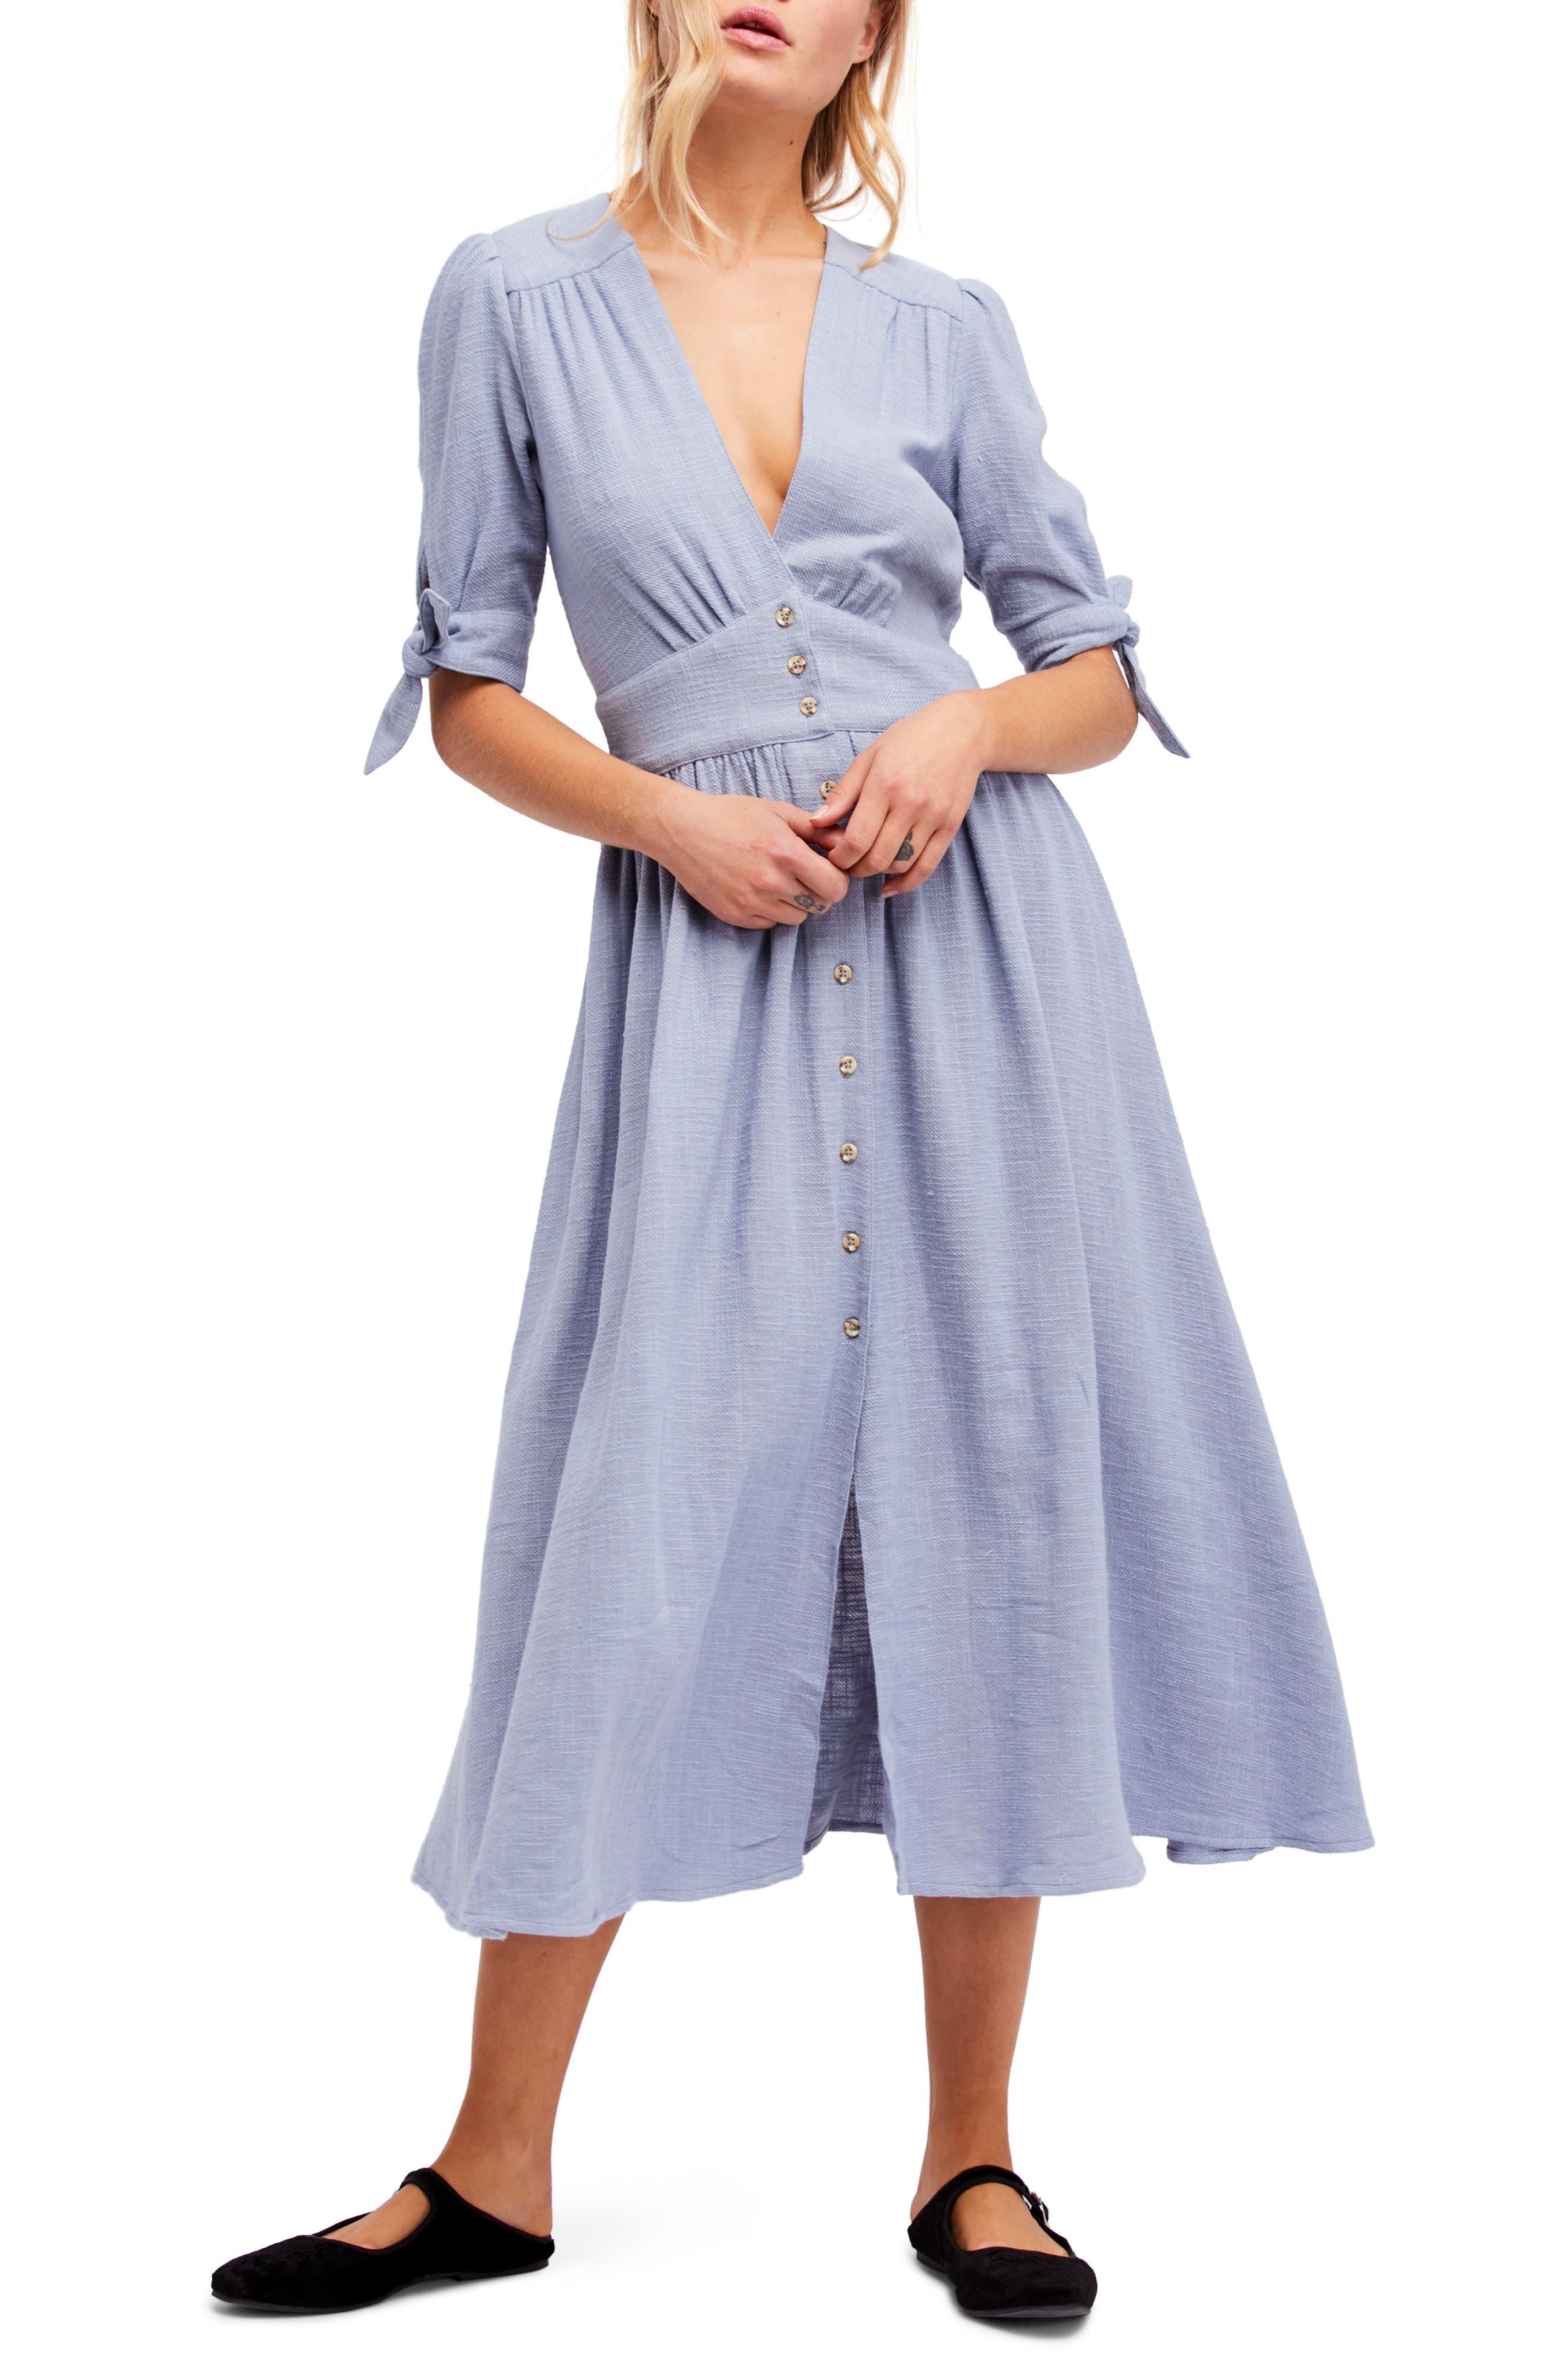 Love of My Life Midi Dress,                             Alternate thumbnail 6, color,                             BLUE